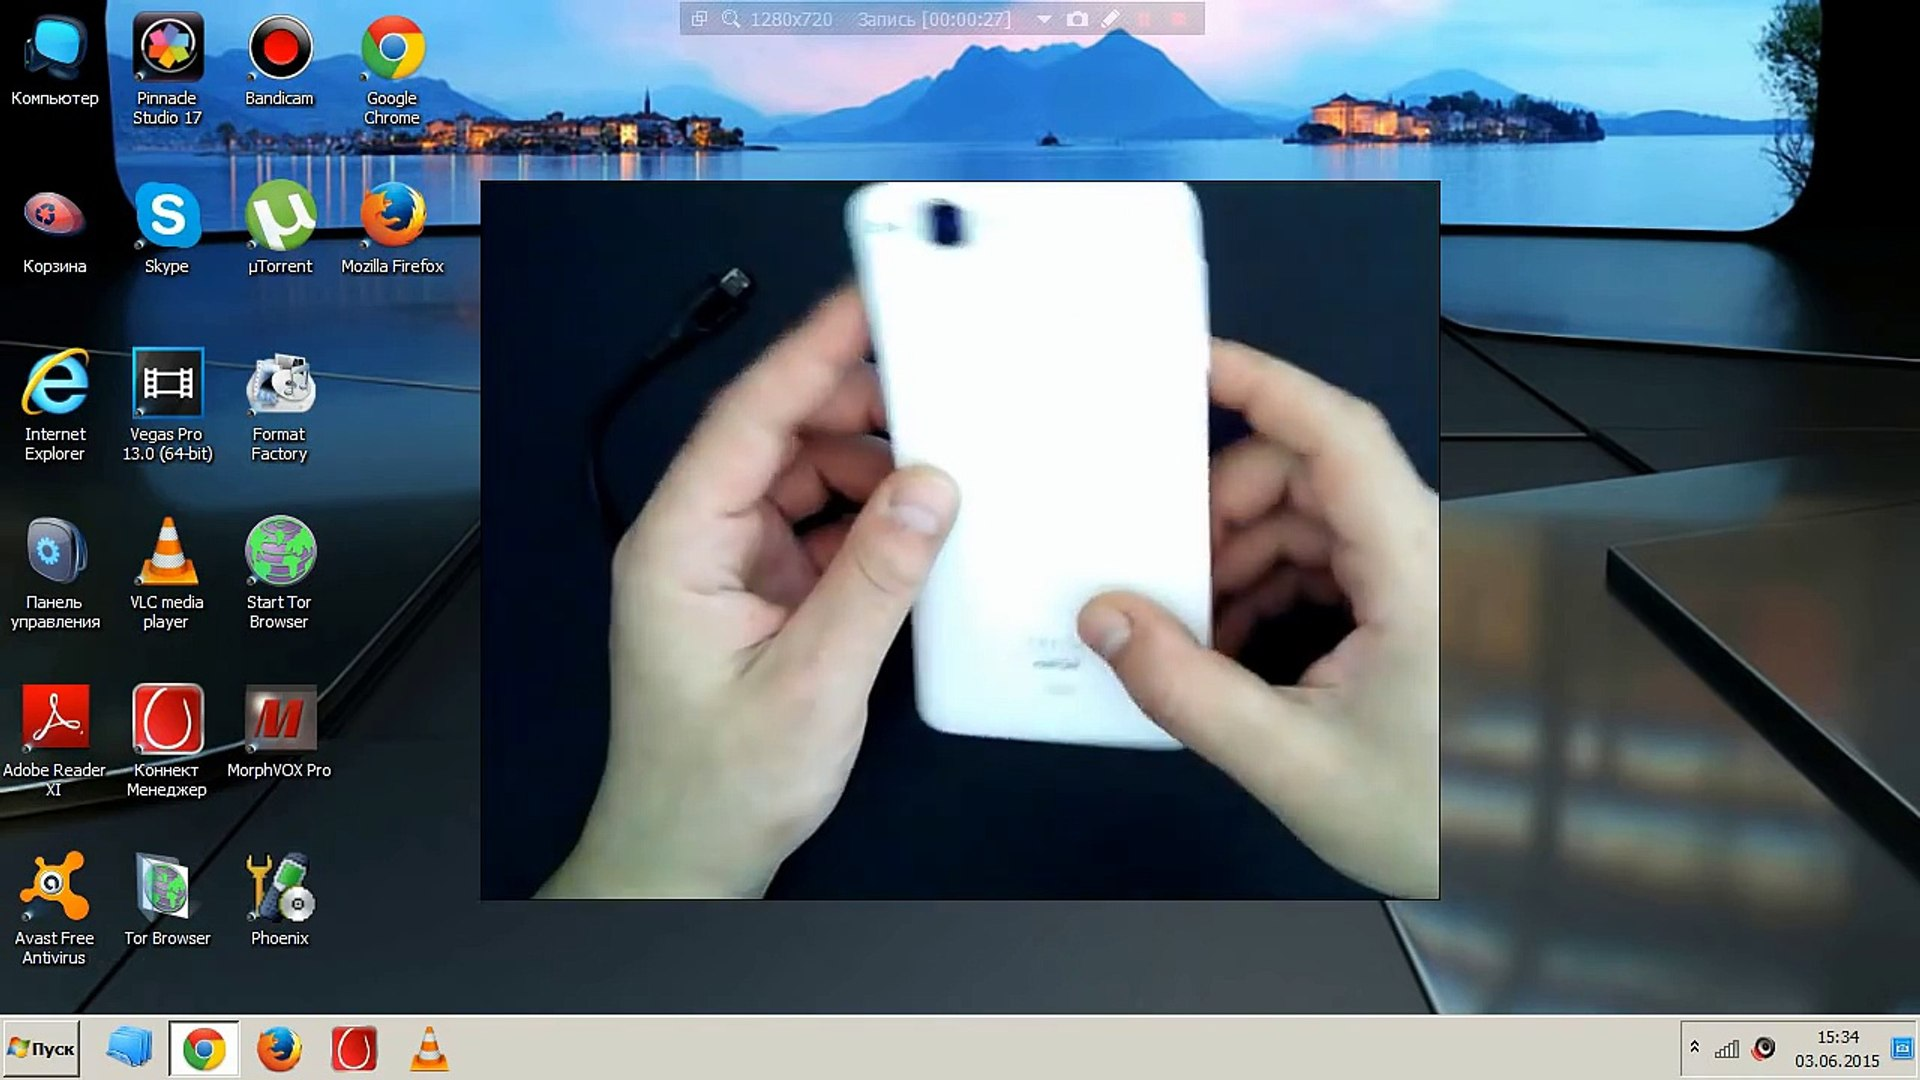 Прошивка Explay Fresh Android 4.4.2 (восстановление из состояния кирпича)!!!